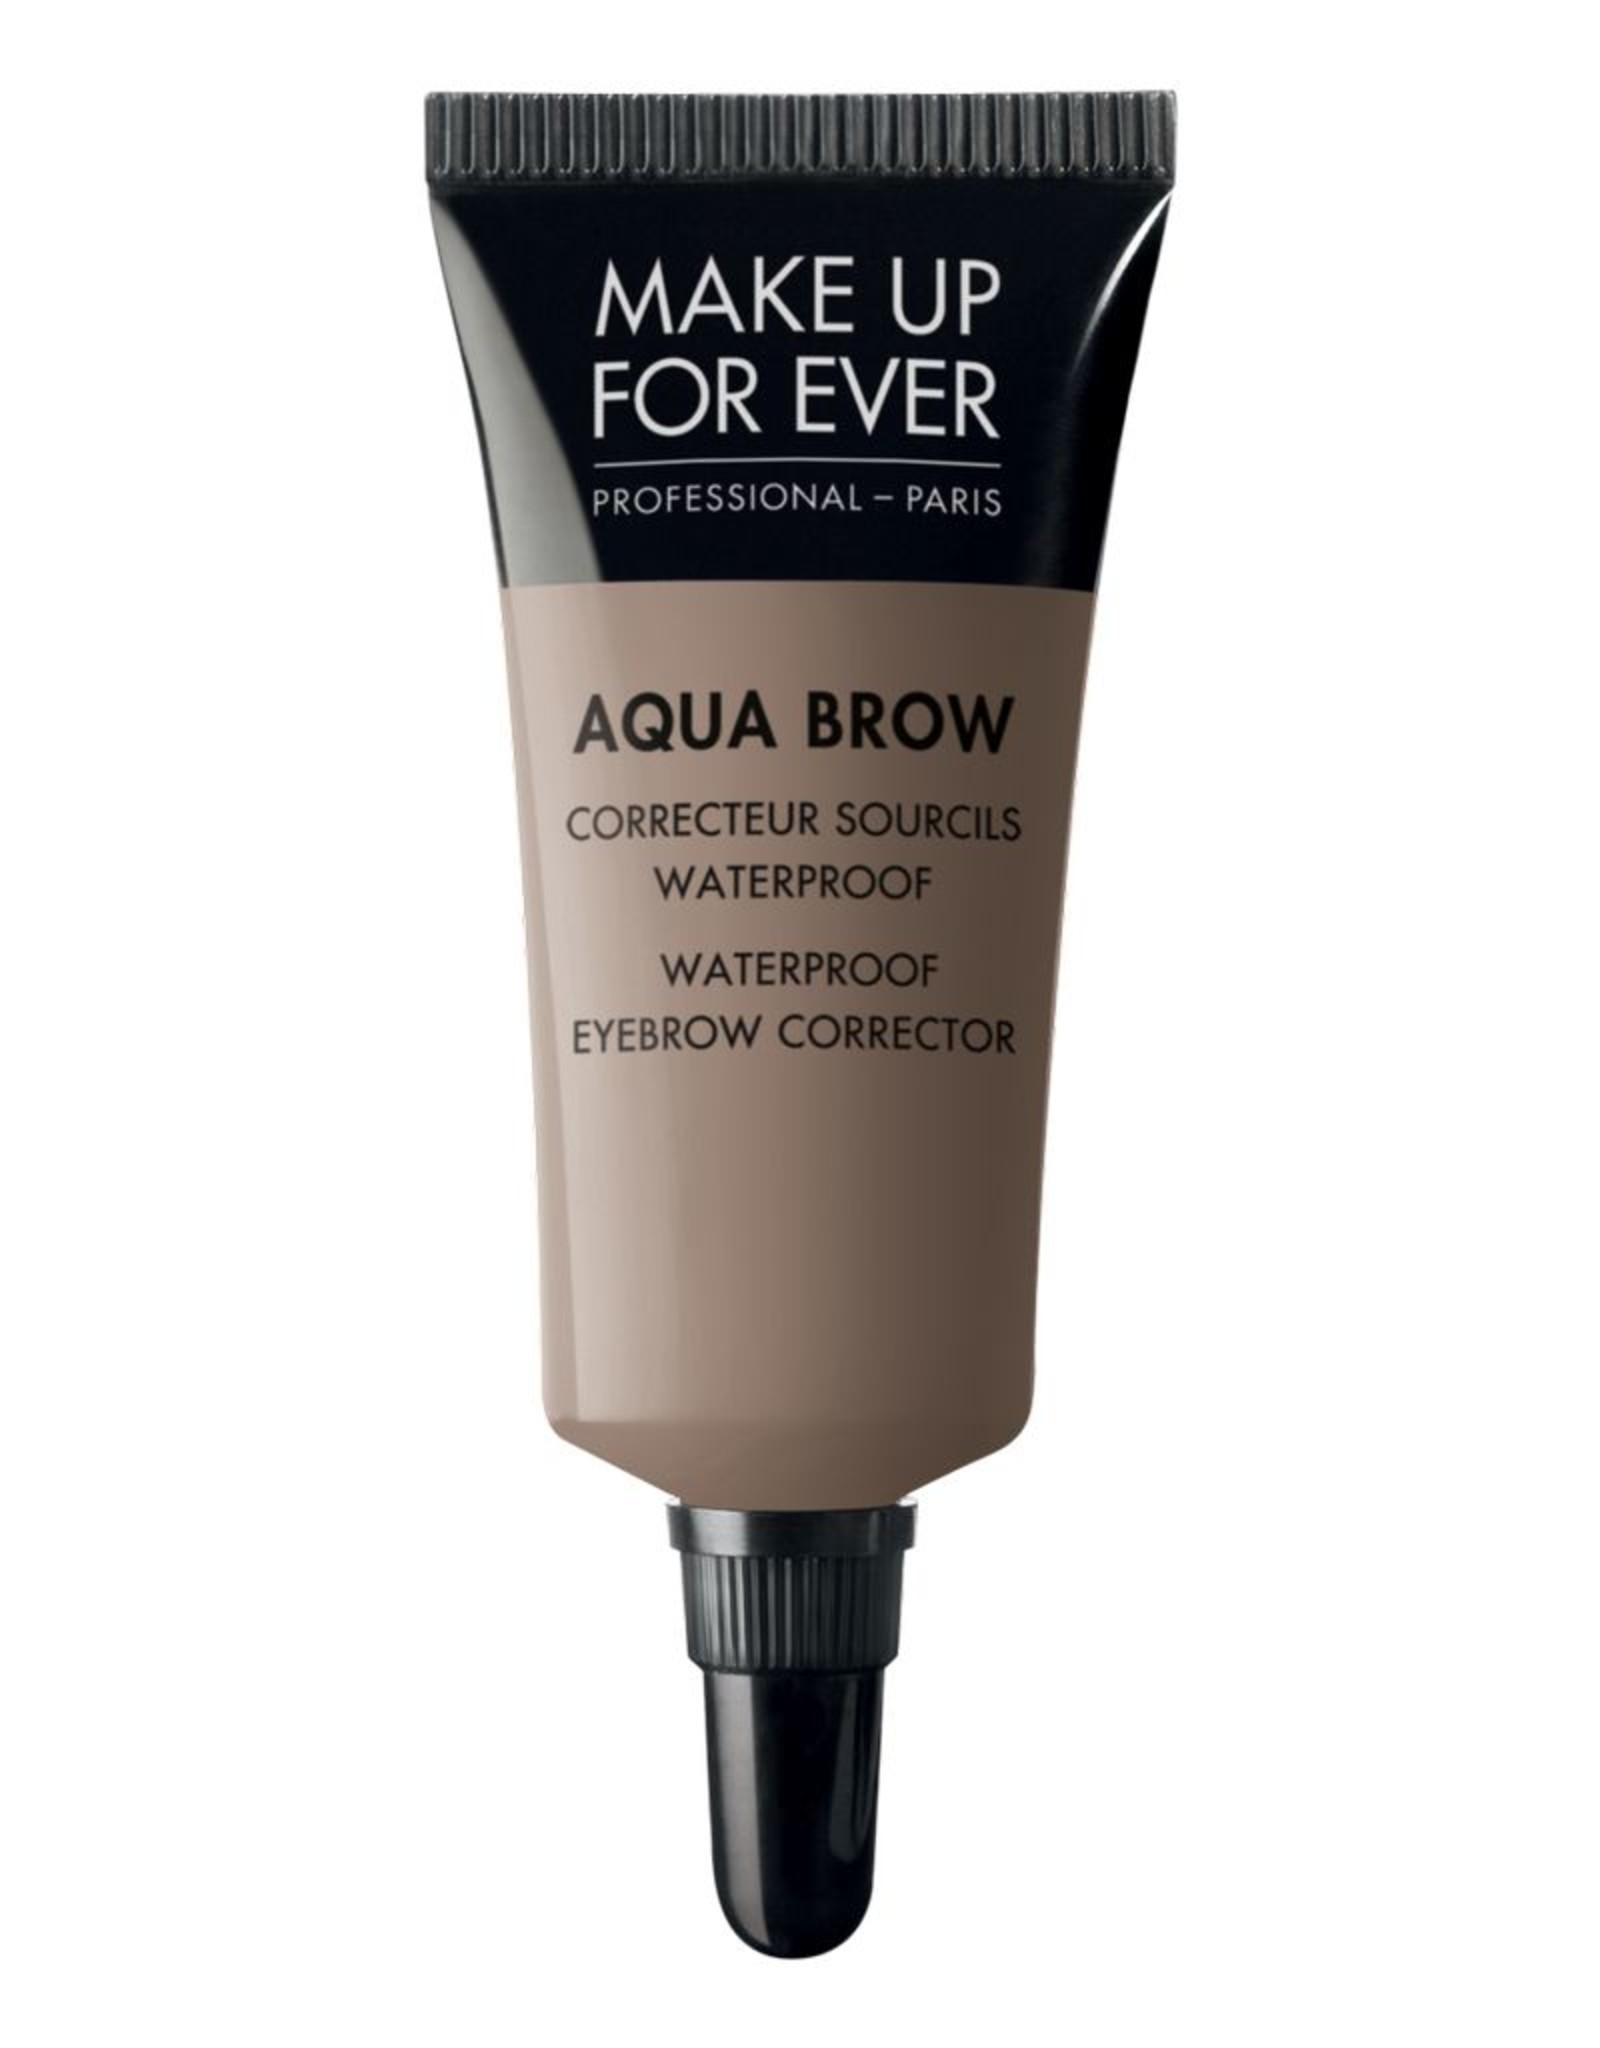 MUFE AQUA BROW 7ml (recharge uniquement)#10 Blond Clair / Light Blond